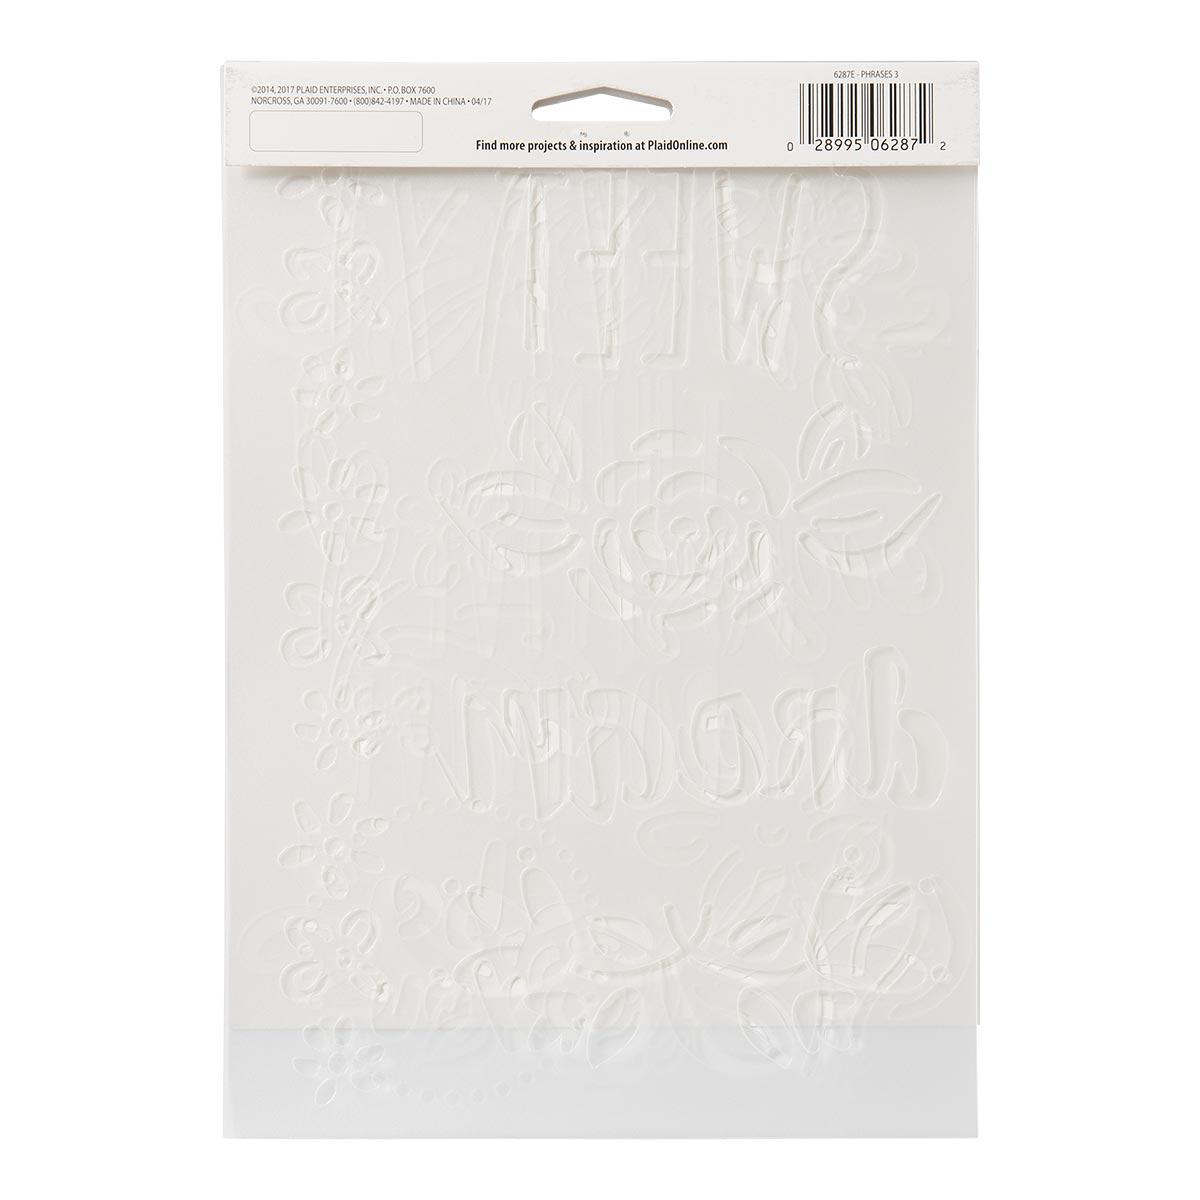 FolkArt ® Stencil Value Packs - Phrases 3, 7